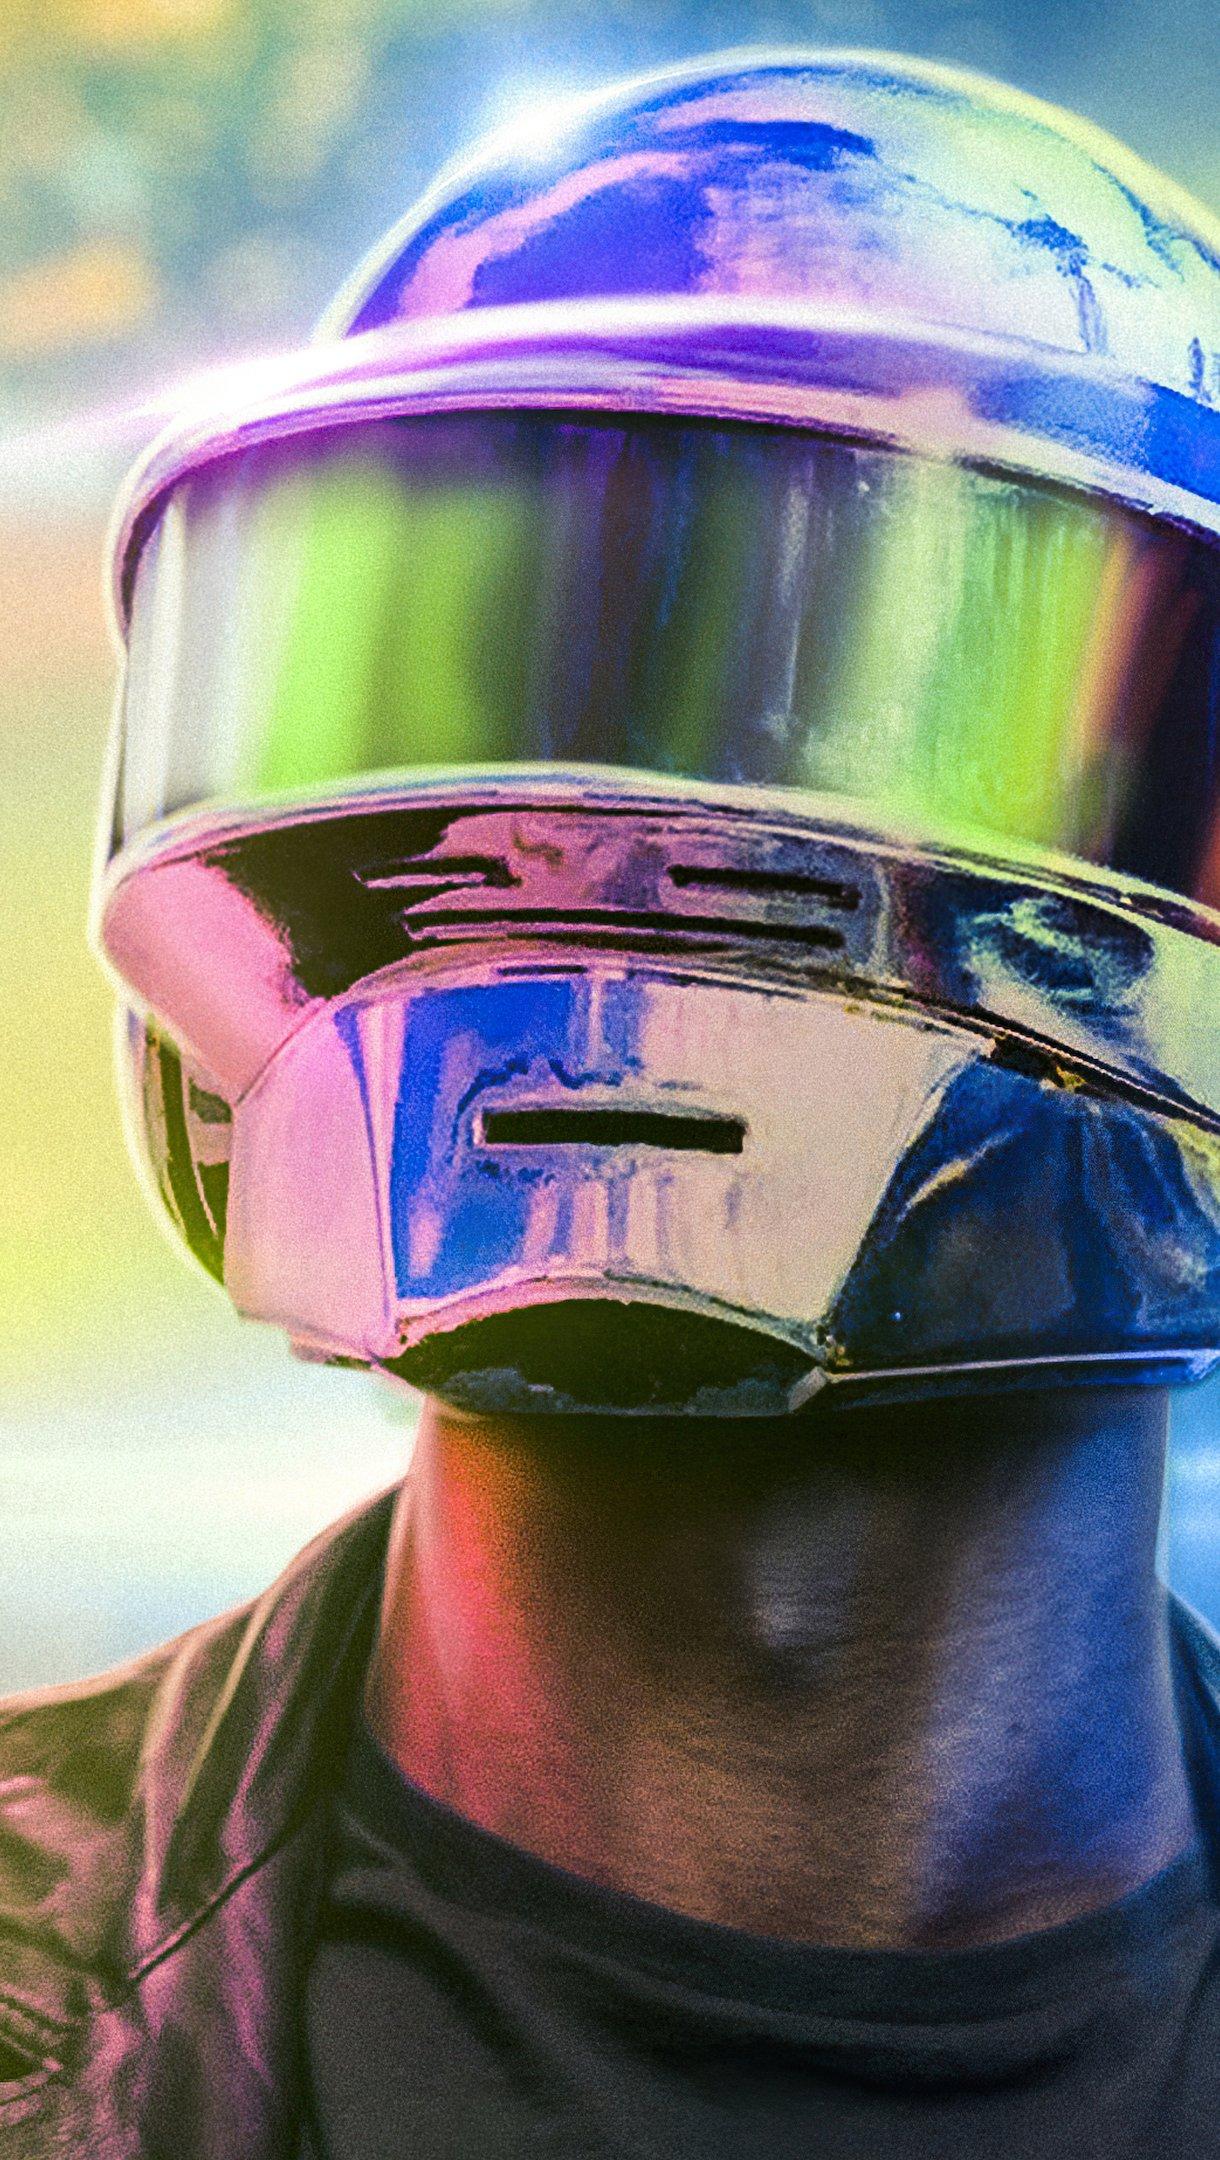 Fondos de pantalla Casco de Daft Punk Vertical